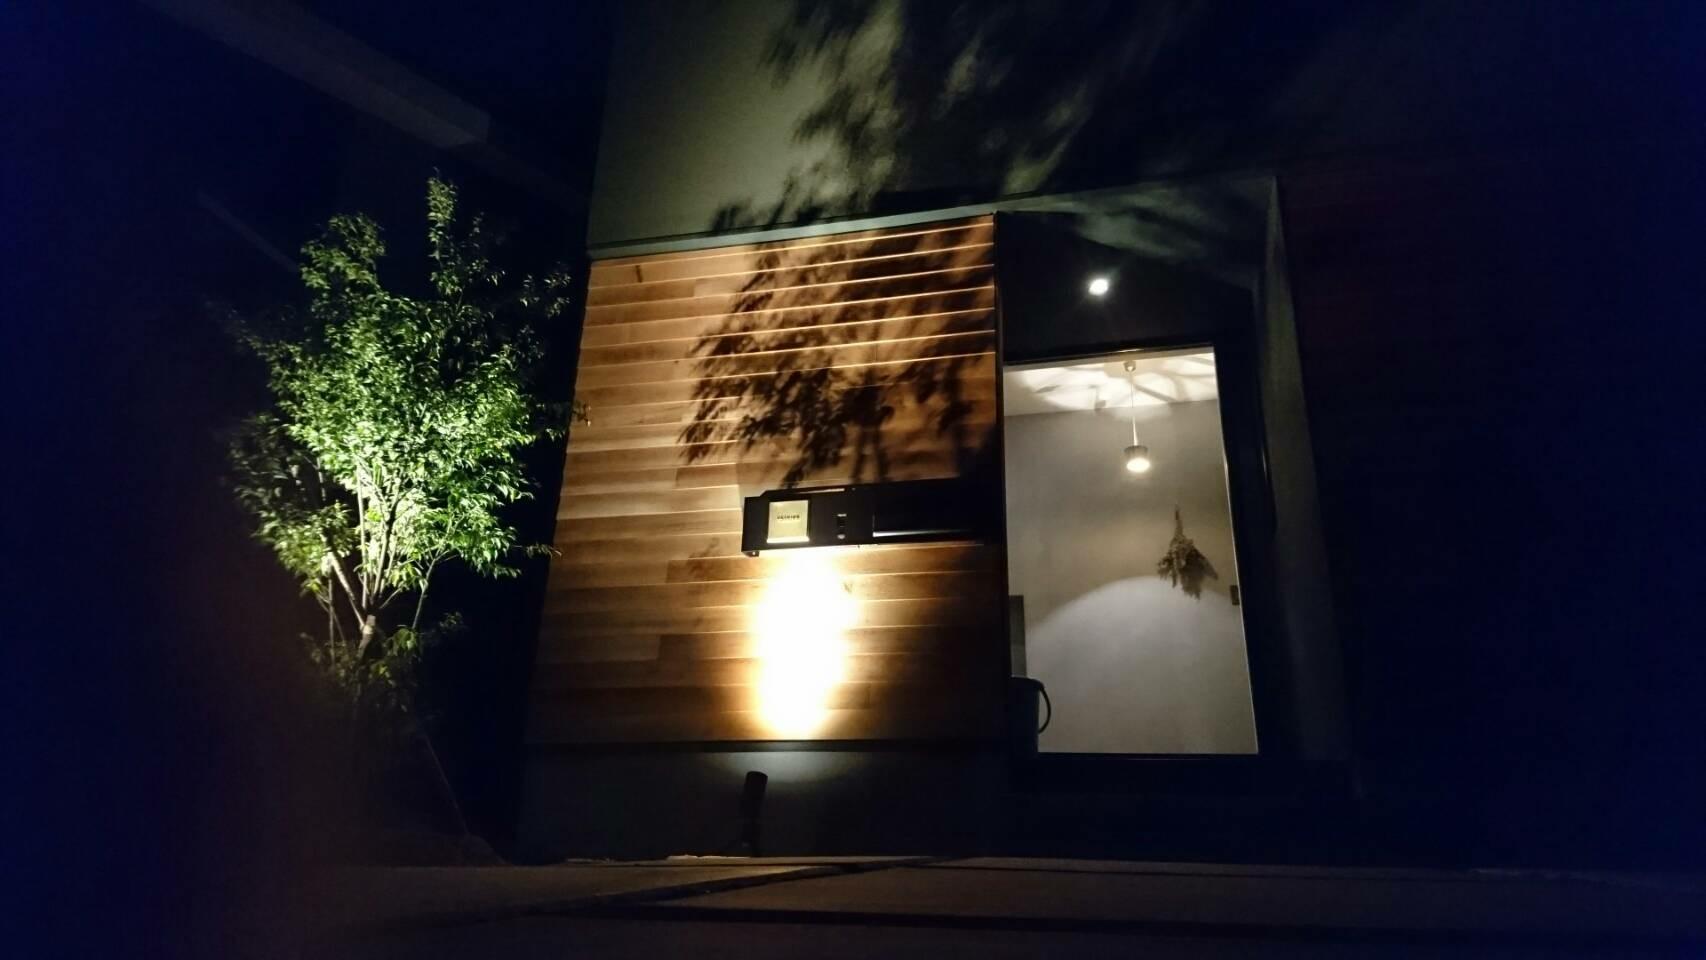 f:id:oroshinoie:20170611013421j:image